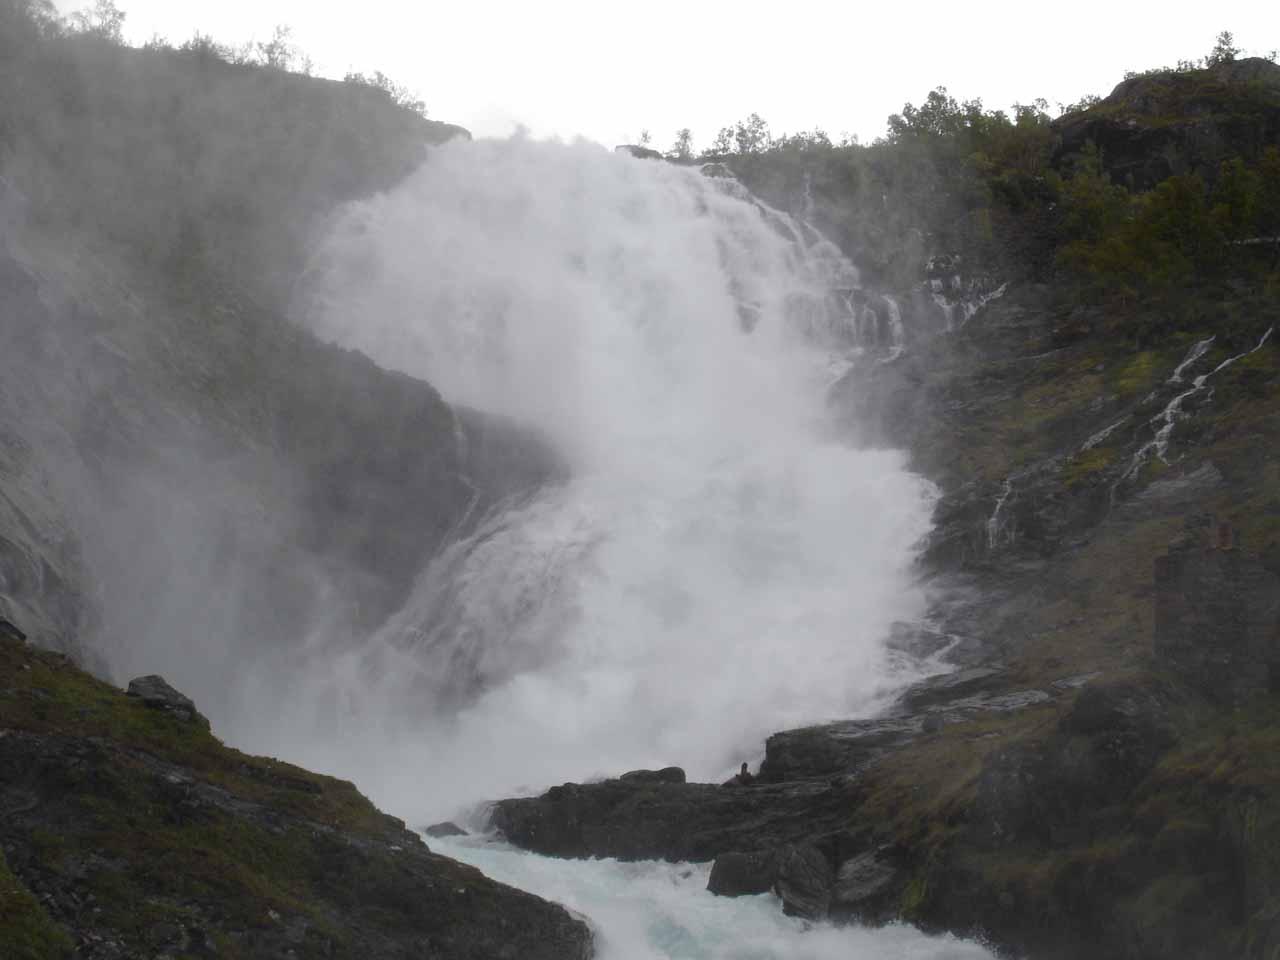 Landscape view of Kjosfossen